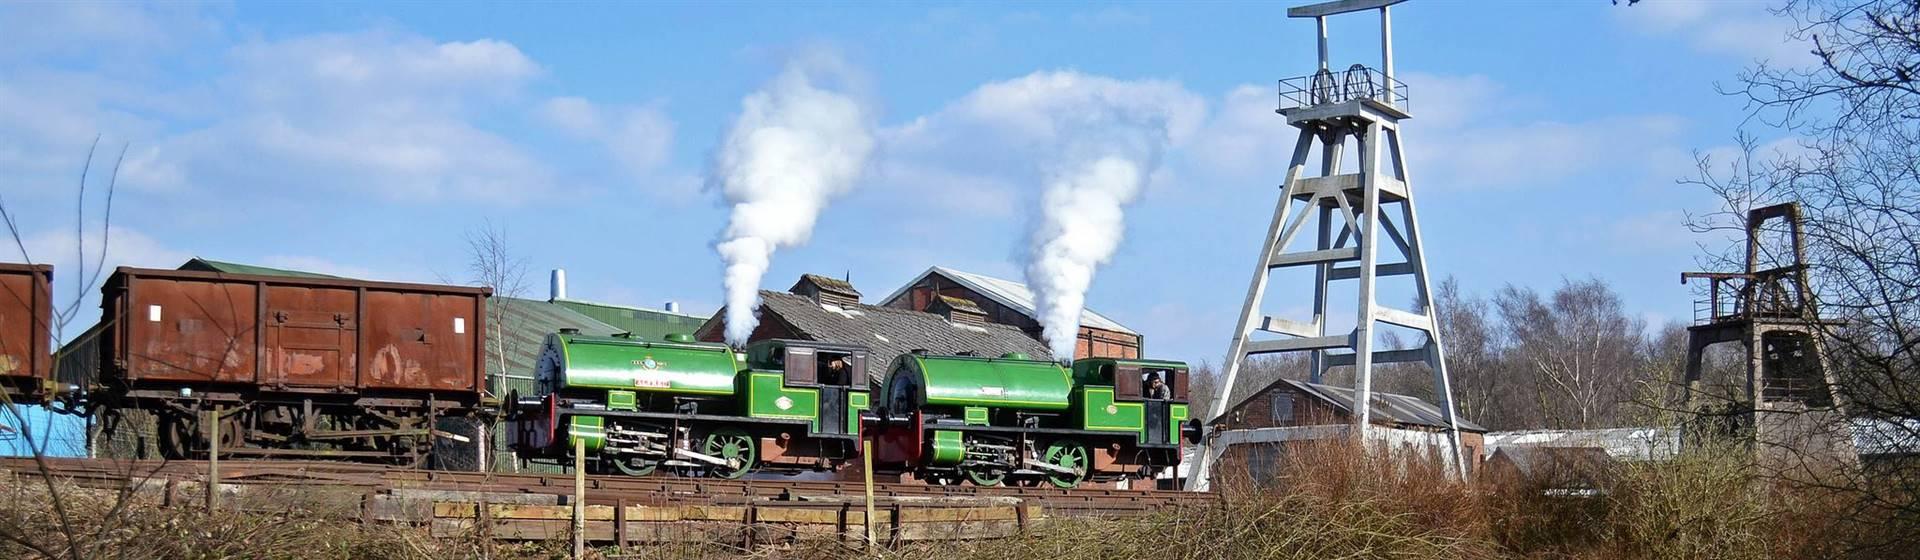 "<img src=""foxfieldfb2.jpeg"" alt=""Foxfield Railway"">"